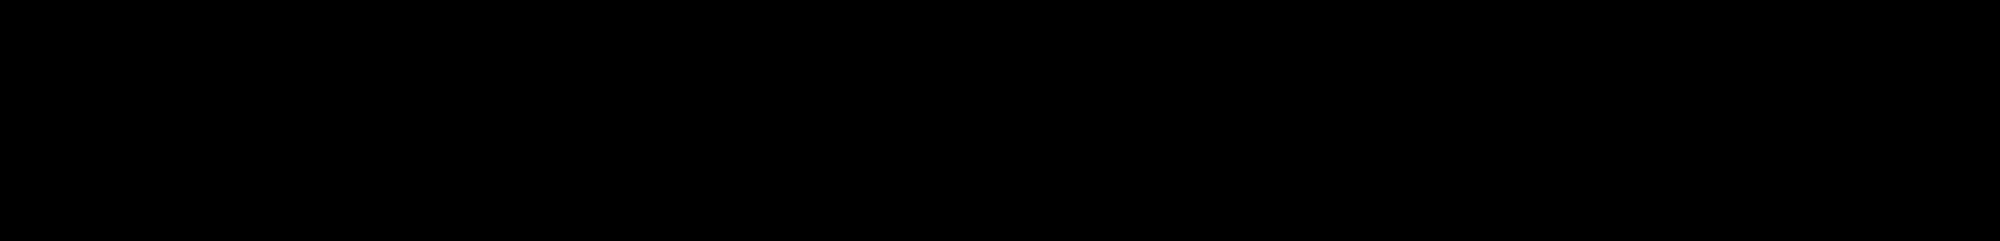 hellosavvy-logo-black